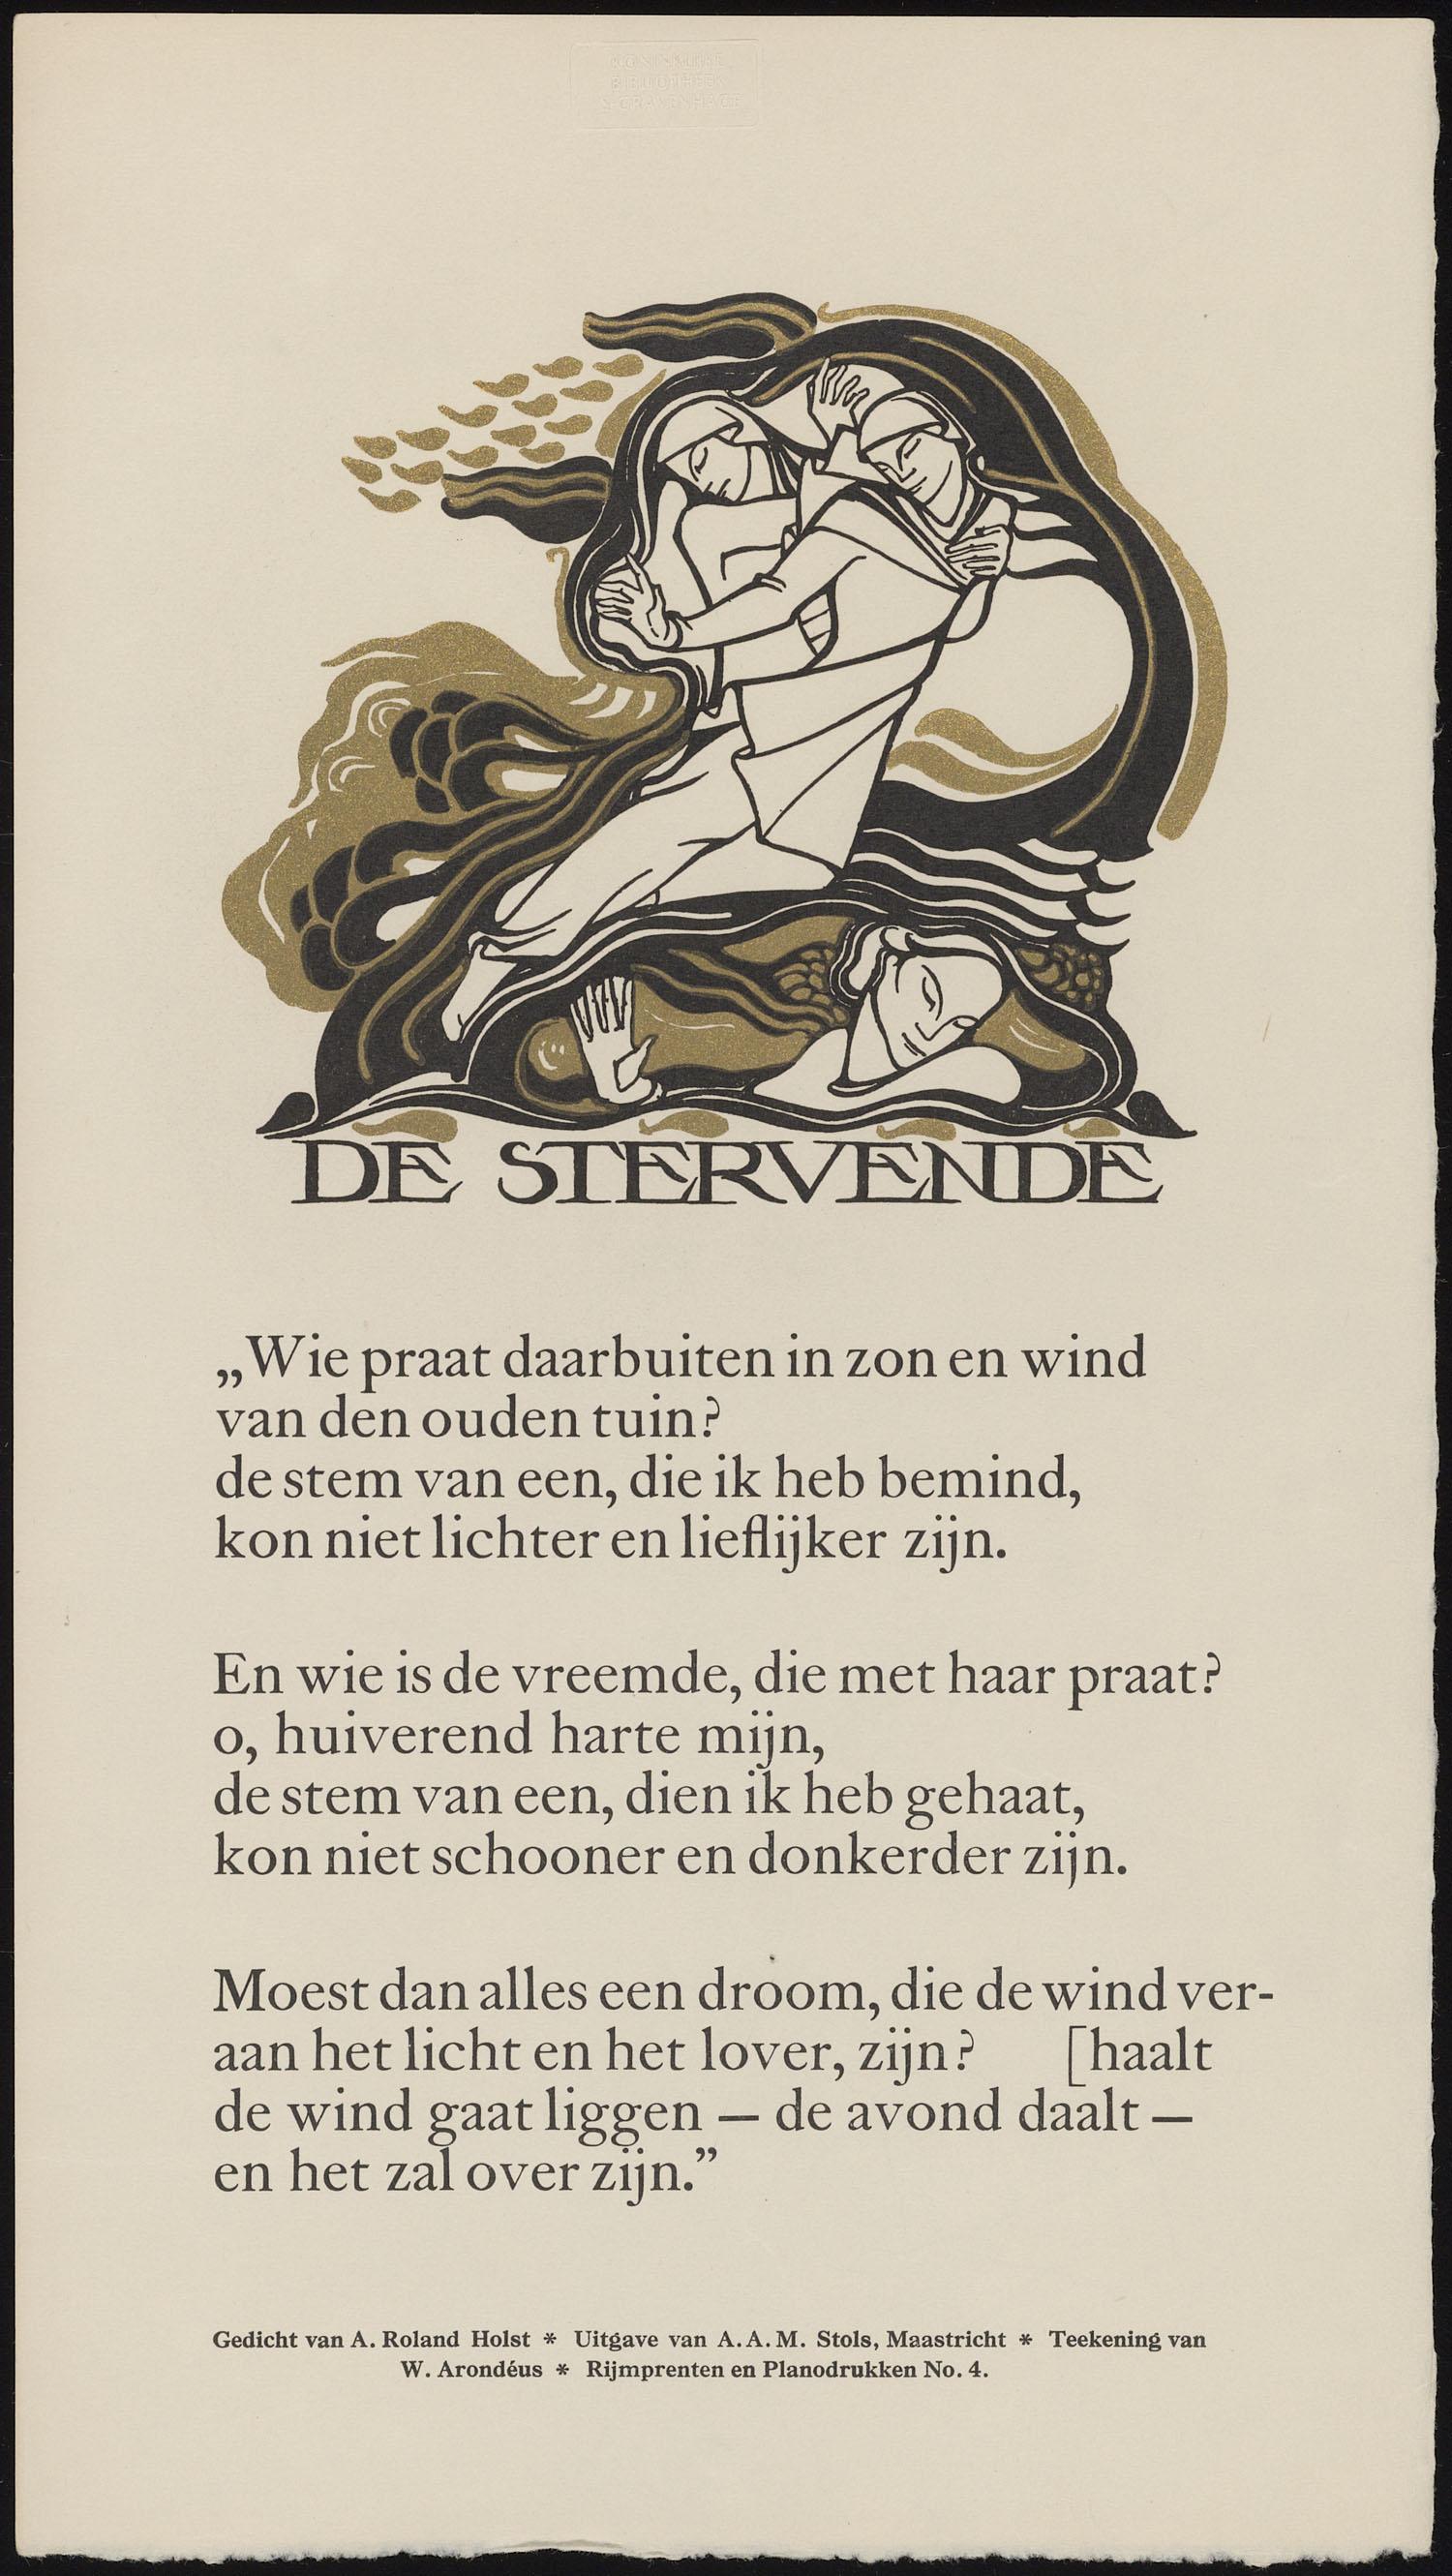 De Stervende Gedicht Van A Roland Holst Teek Van W